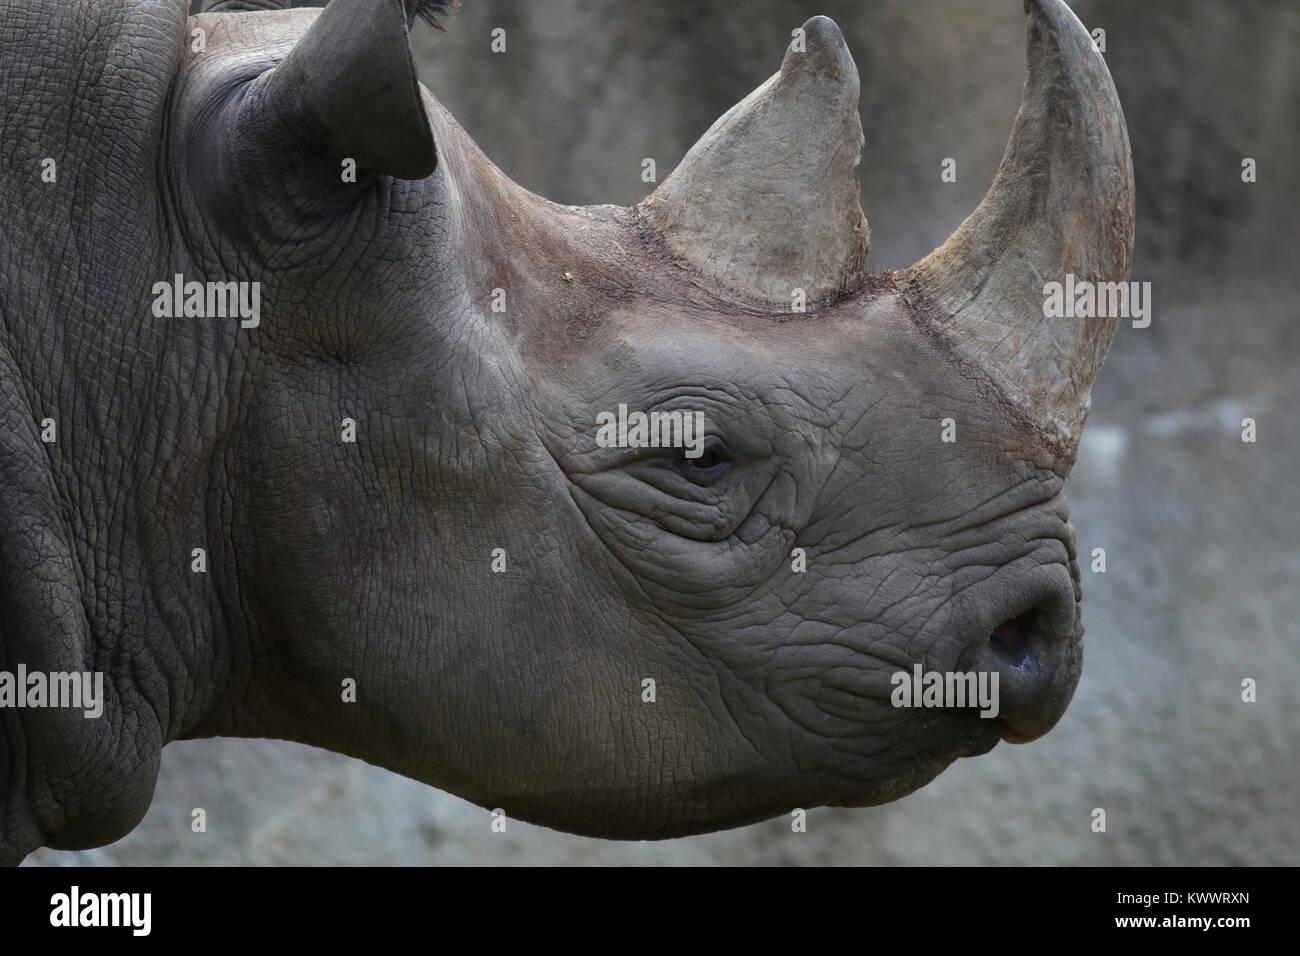 black rhinoceros mother and baby at Cincinnati zoo - Stock Image